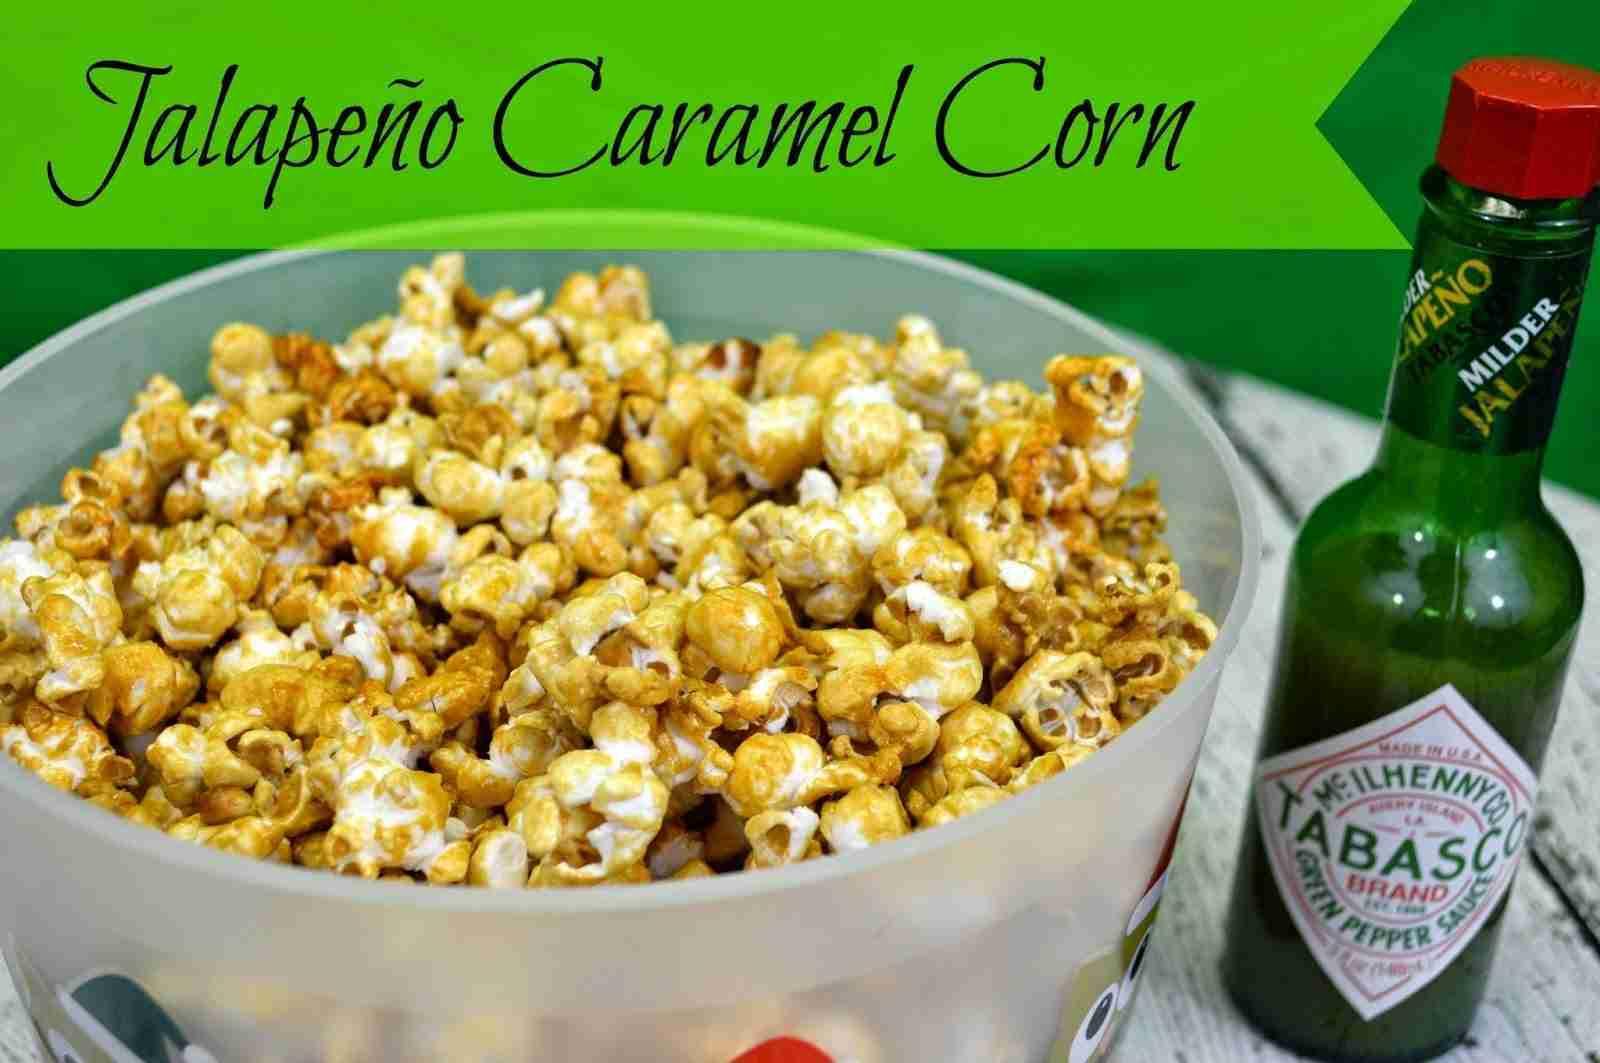 jalapeno caramel corn recipe